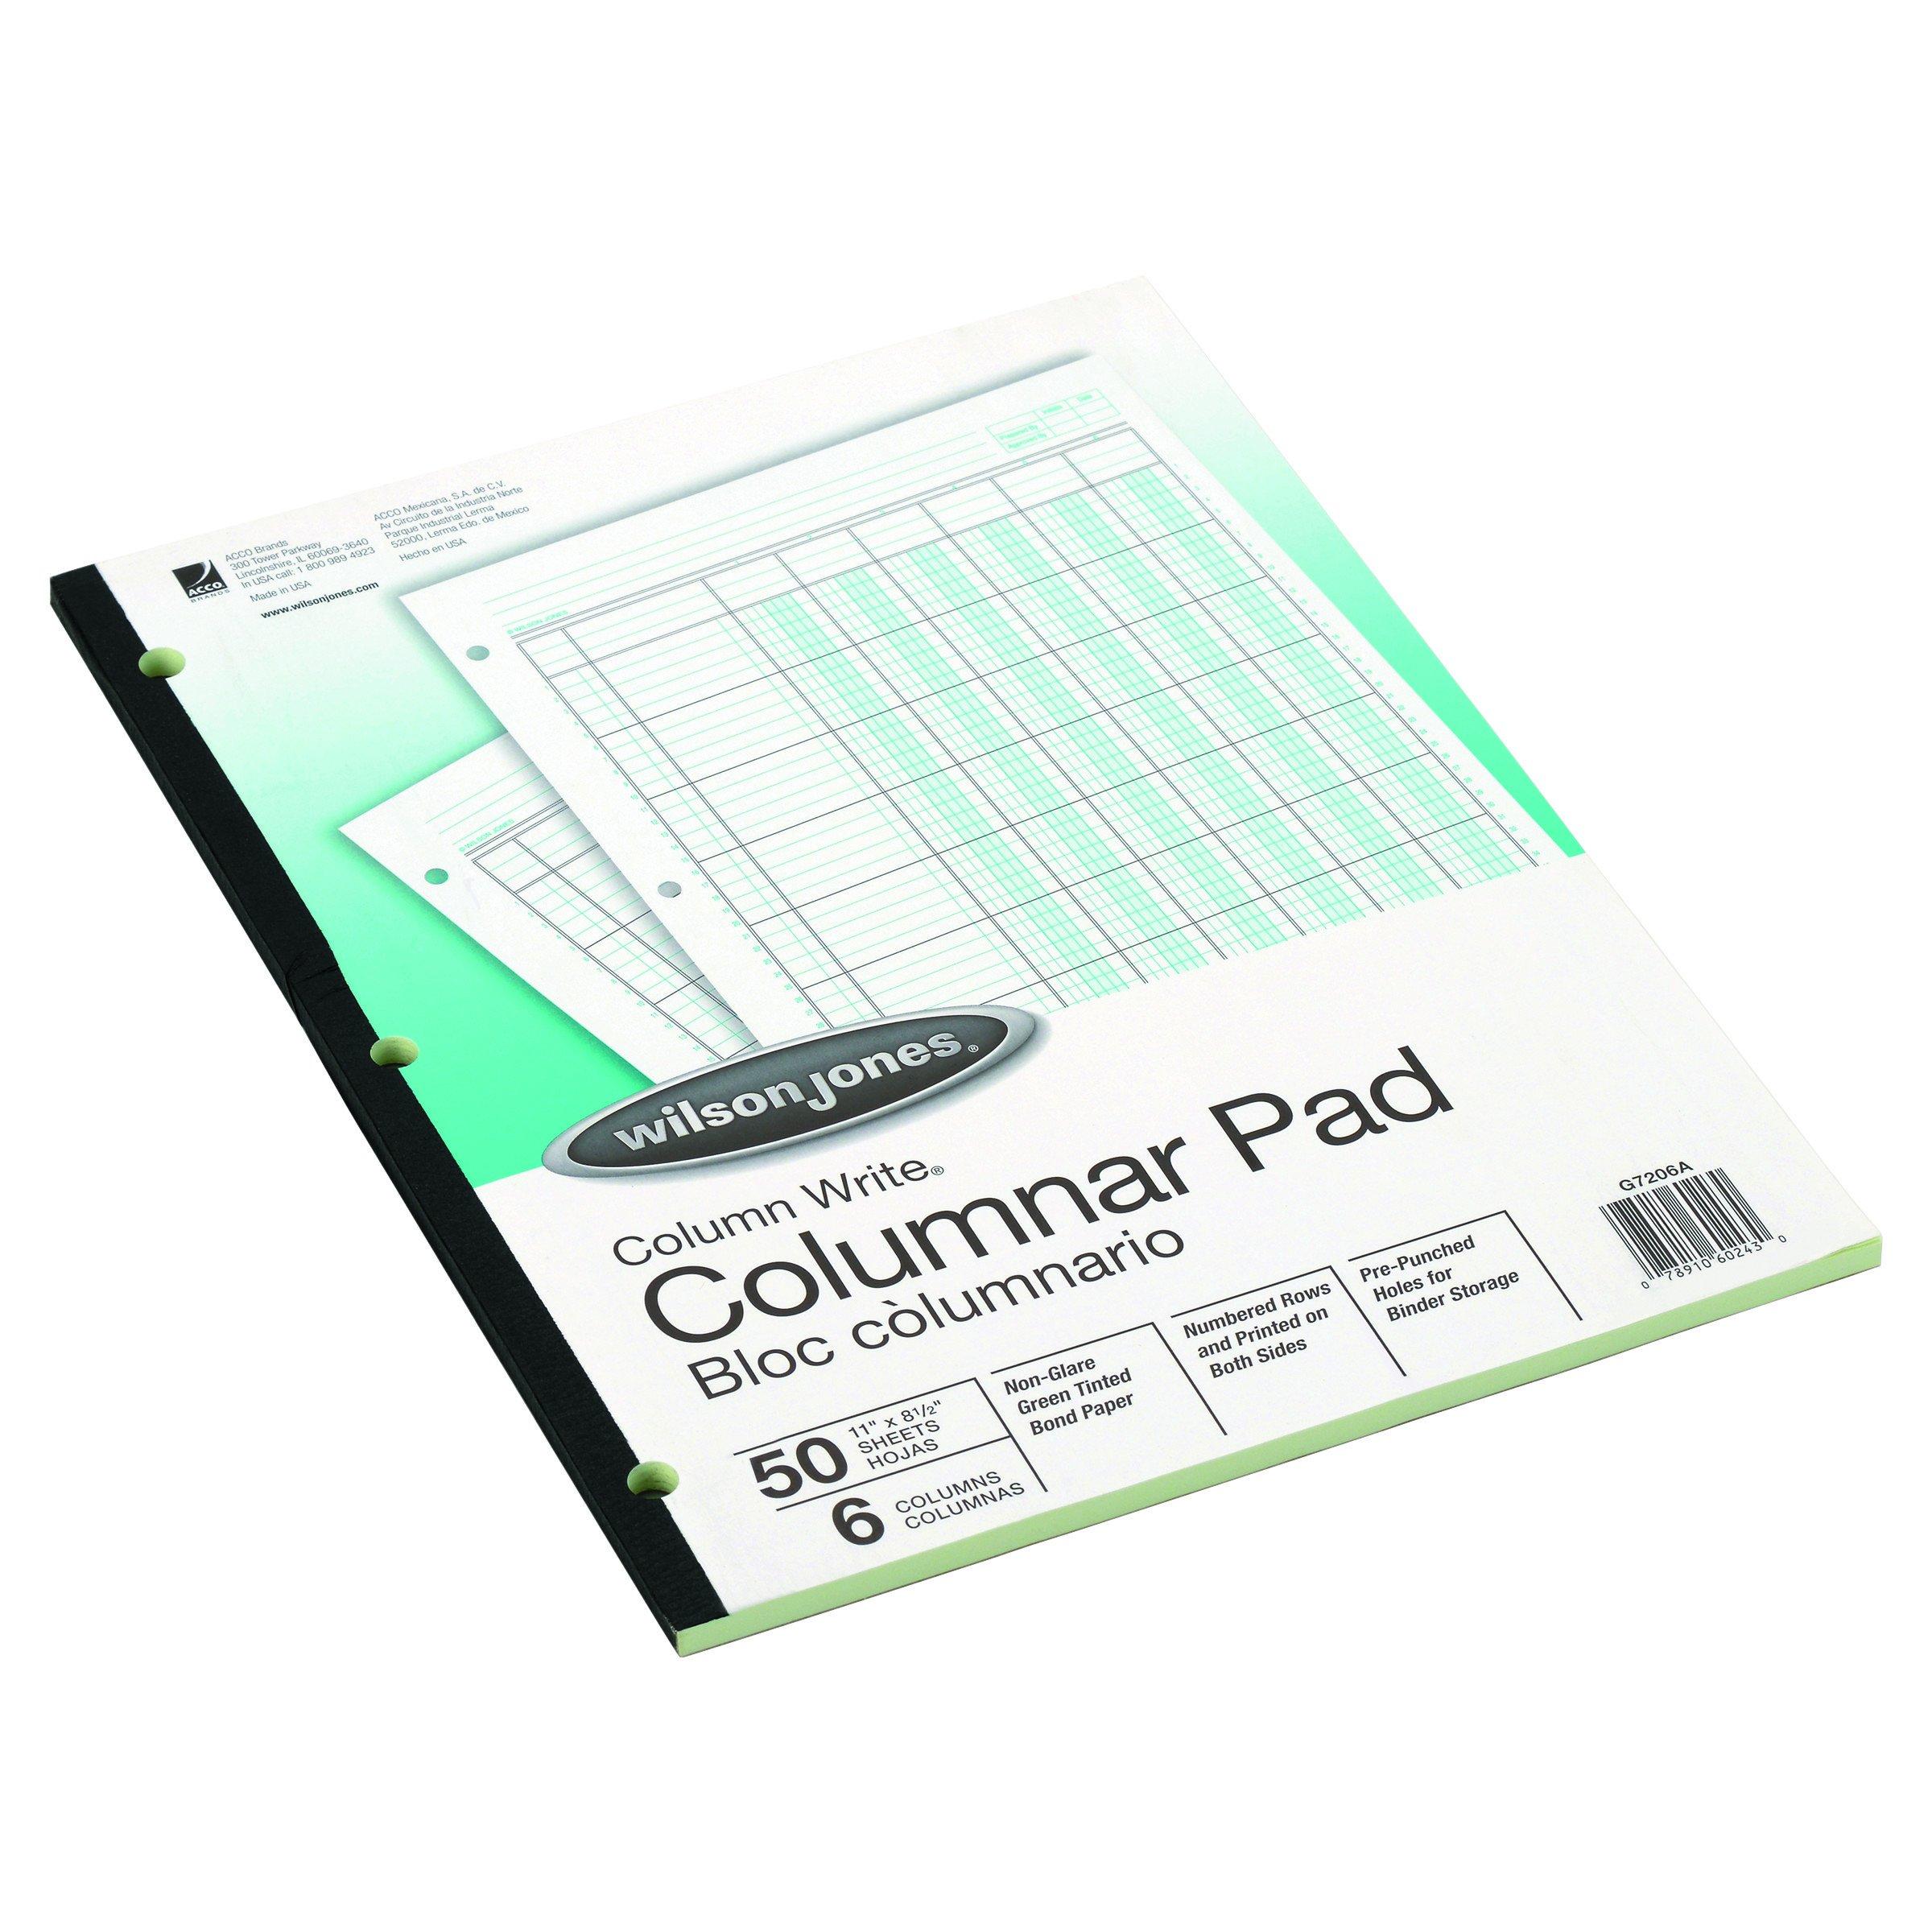 Wilson Jones G7206A Accounting Pad, Six-Unit Columns, 8-1/2 x 11, 50-Sheet Pad